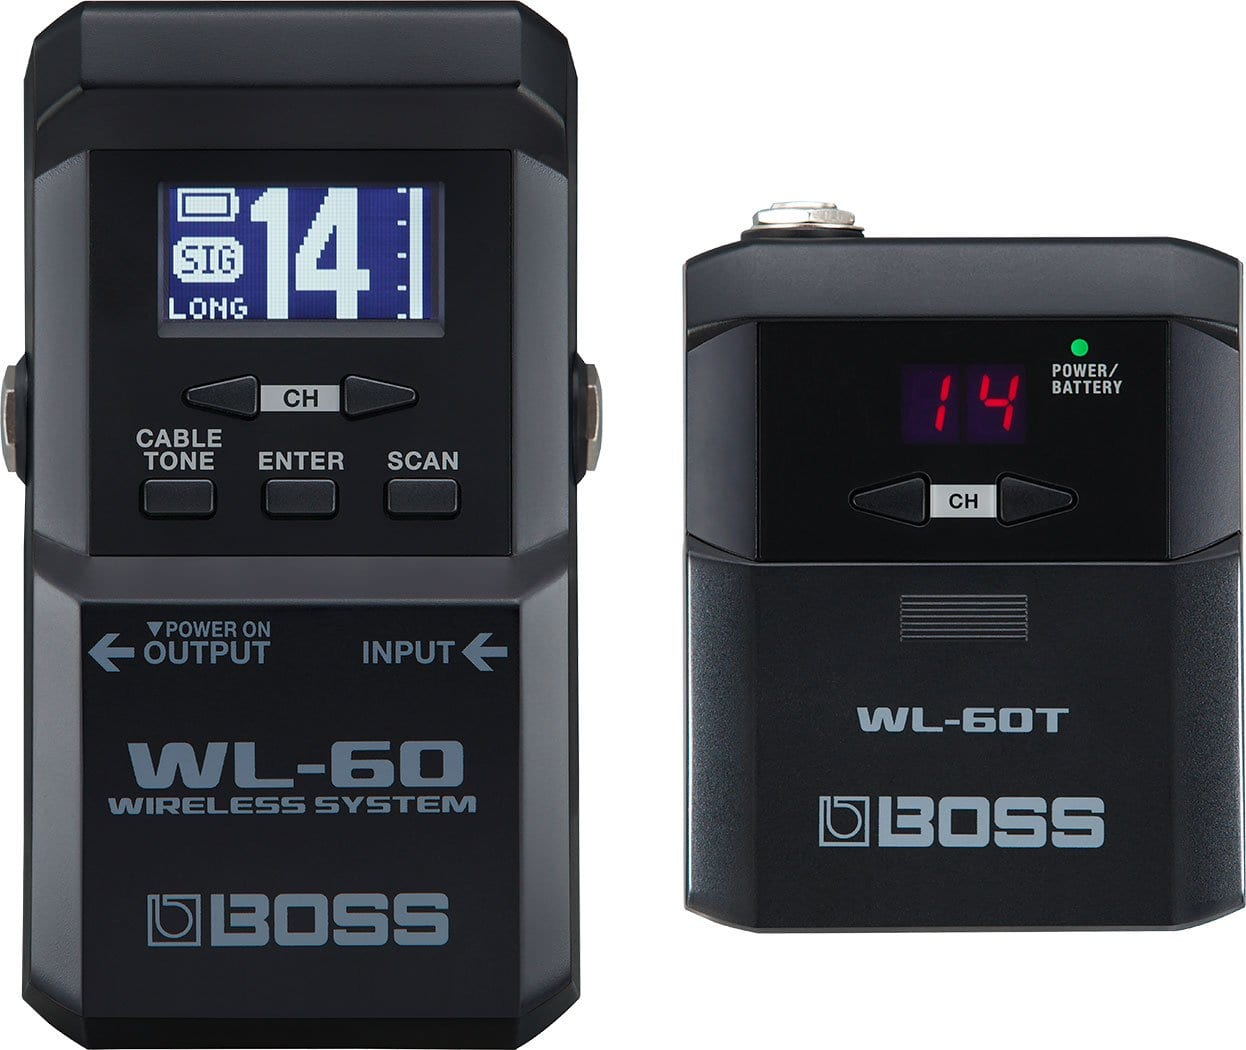 Sistema inalámbrico Boss WL-60